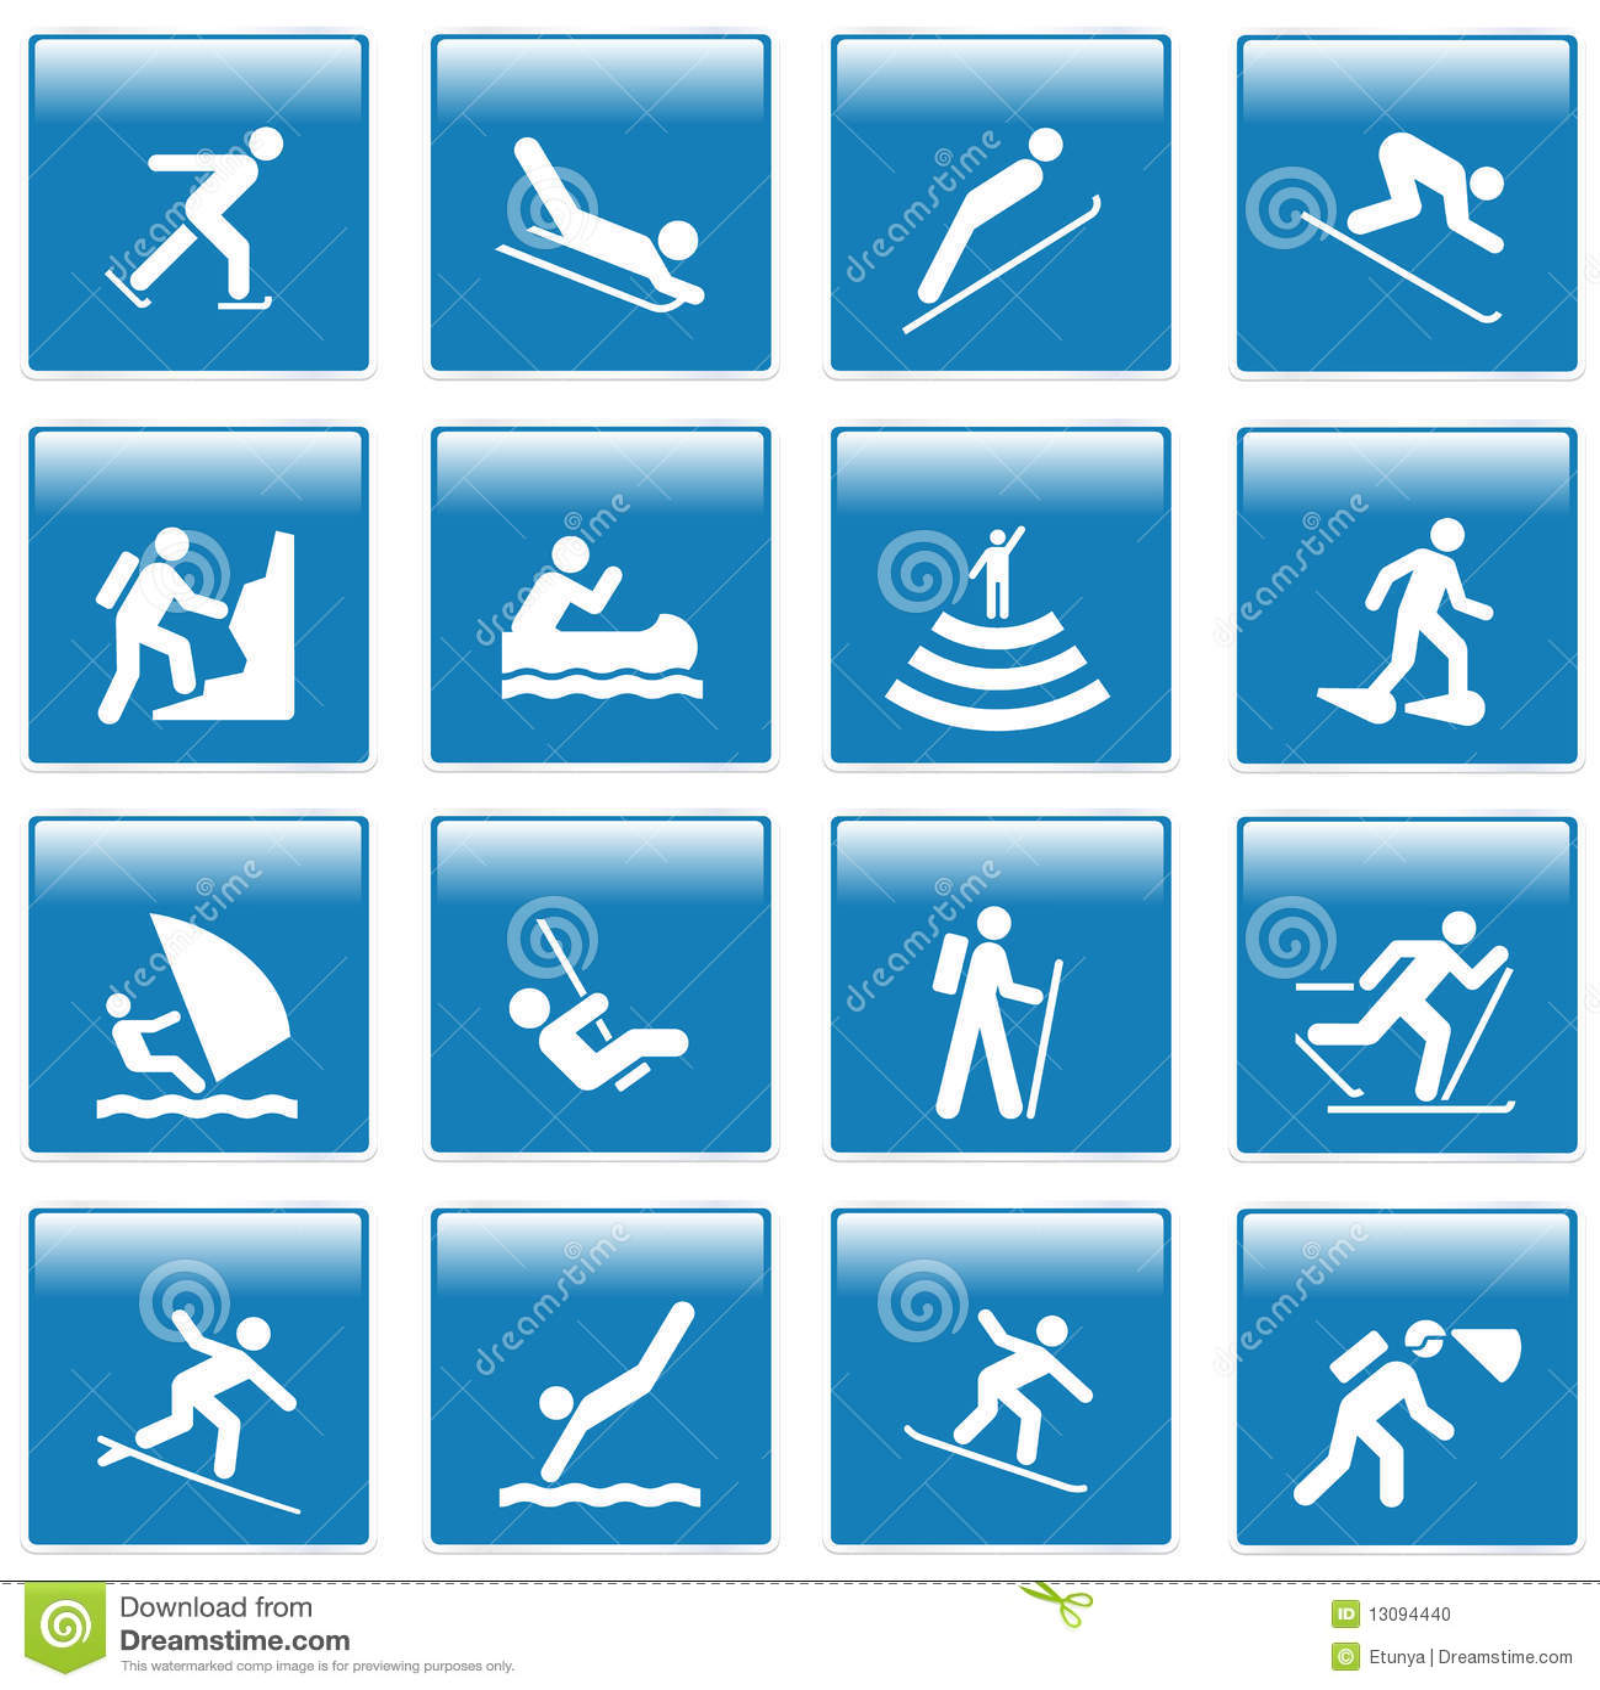 Iconsetwinterolympics icons  Download 15 free amp premium